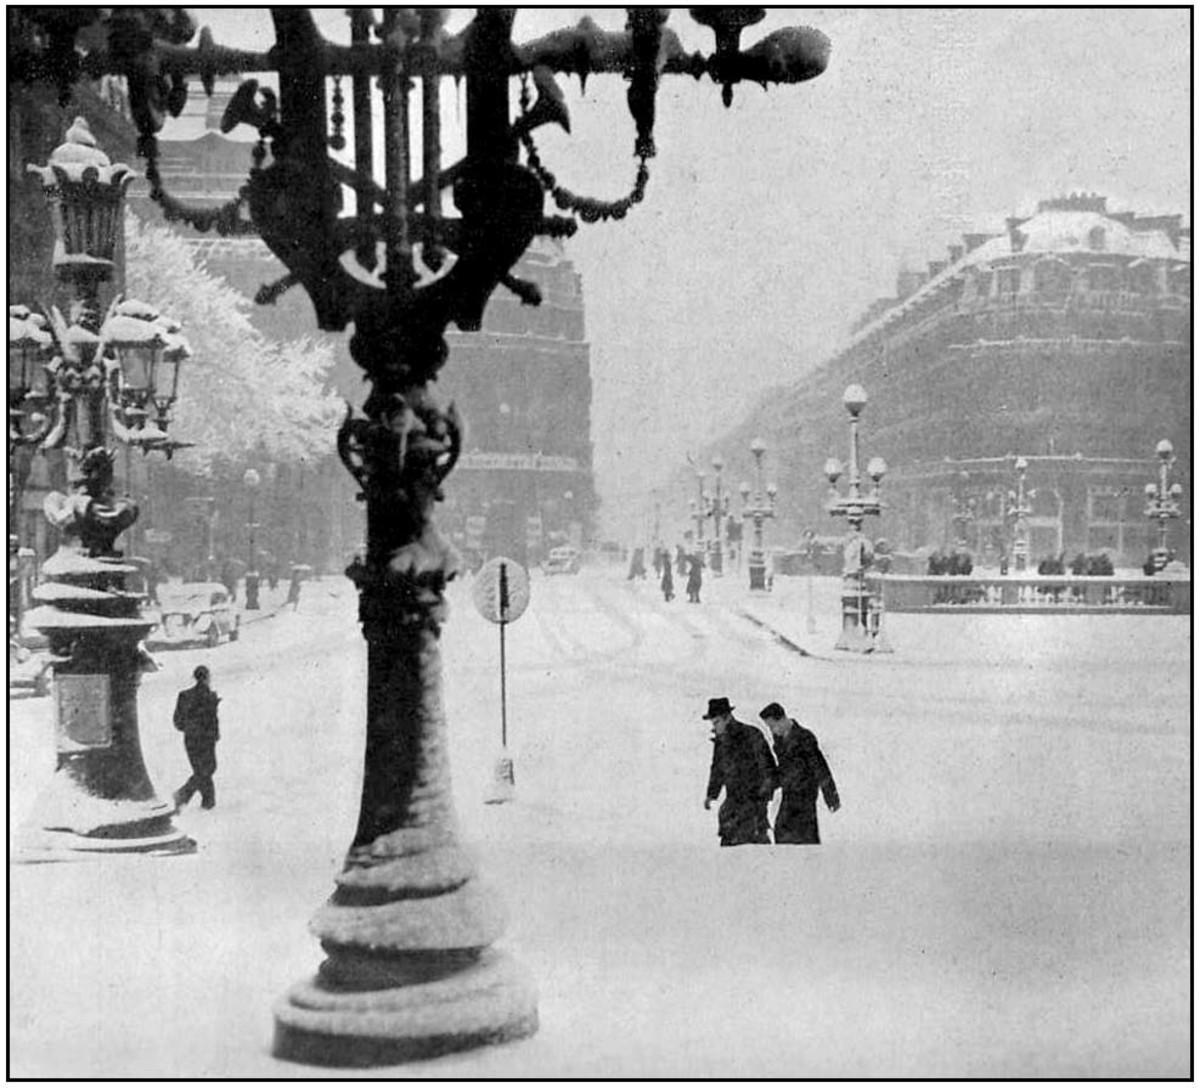 February 3rd 1941. Place de l'Opera seen from the steps of the Palais Garnier, Paris Opera House